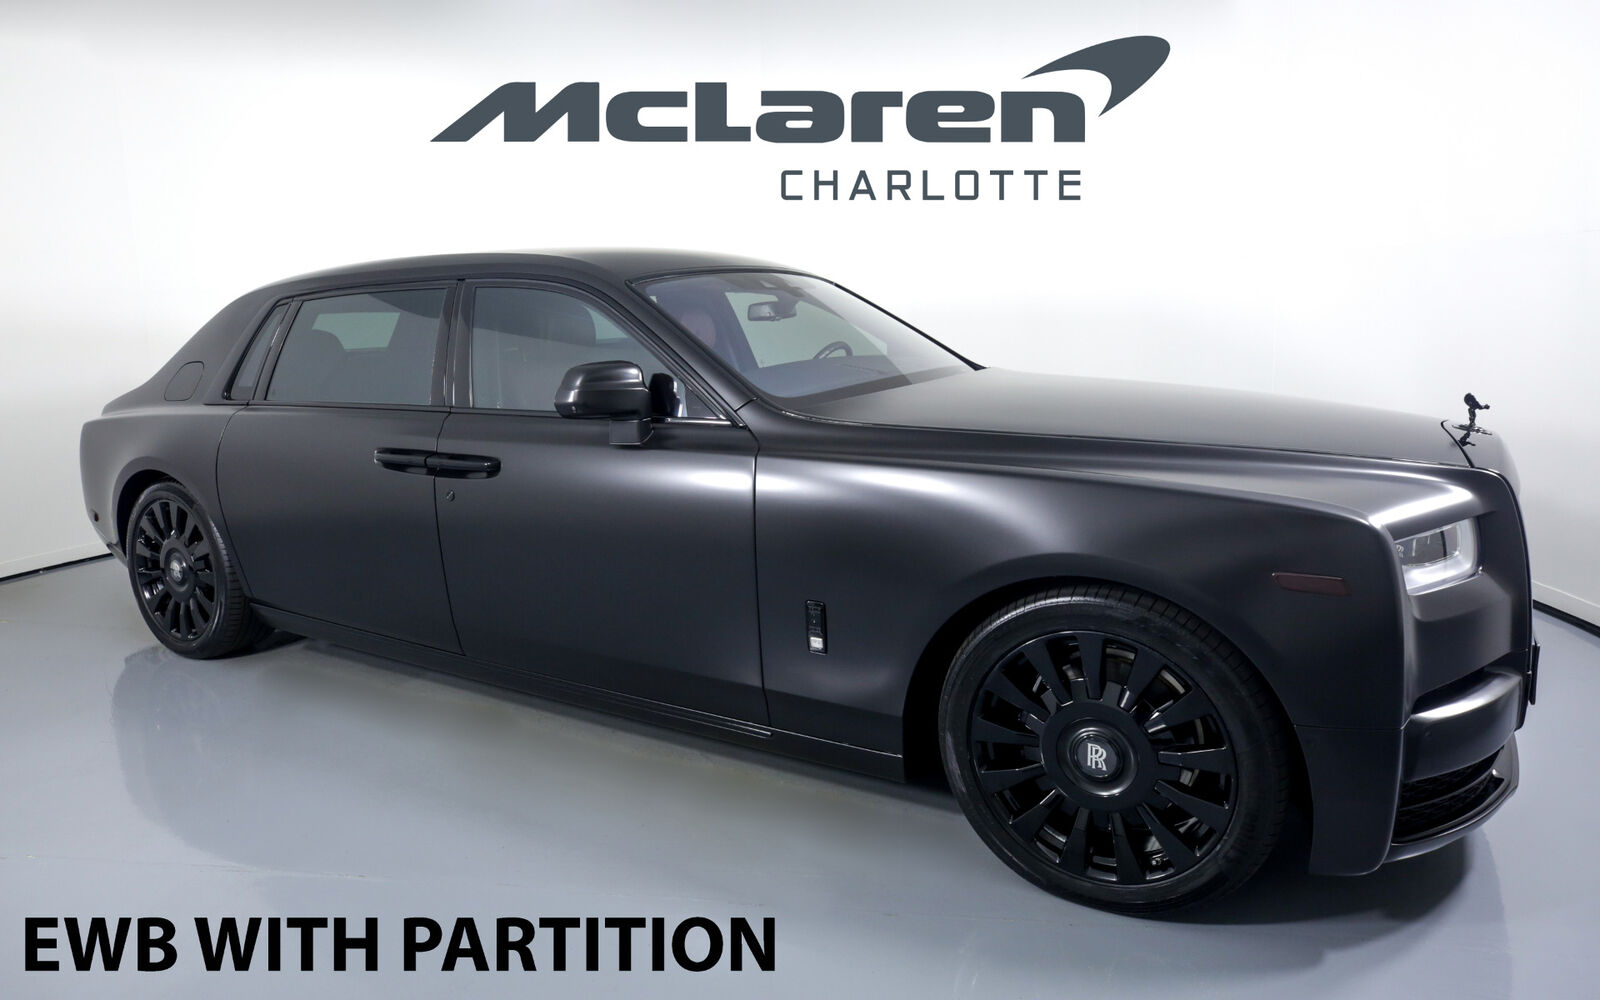 2018 Rolls-Royce Phantom EWB (Used - 649996 USD)